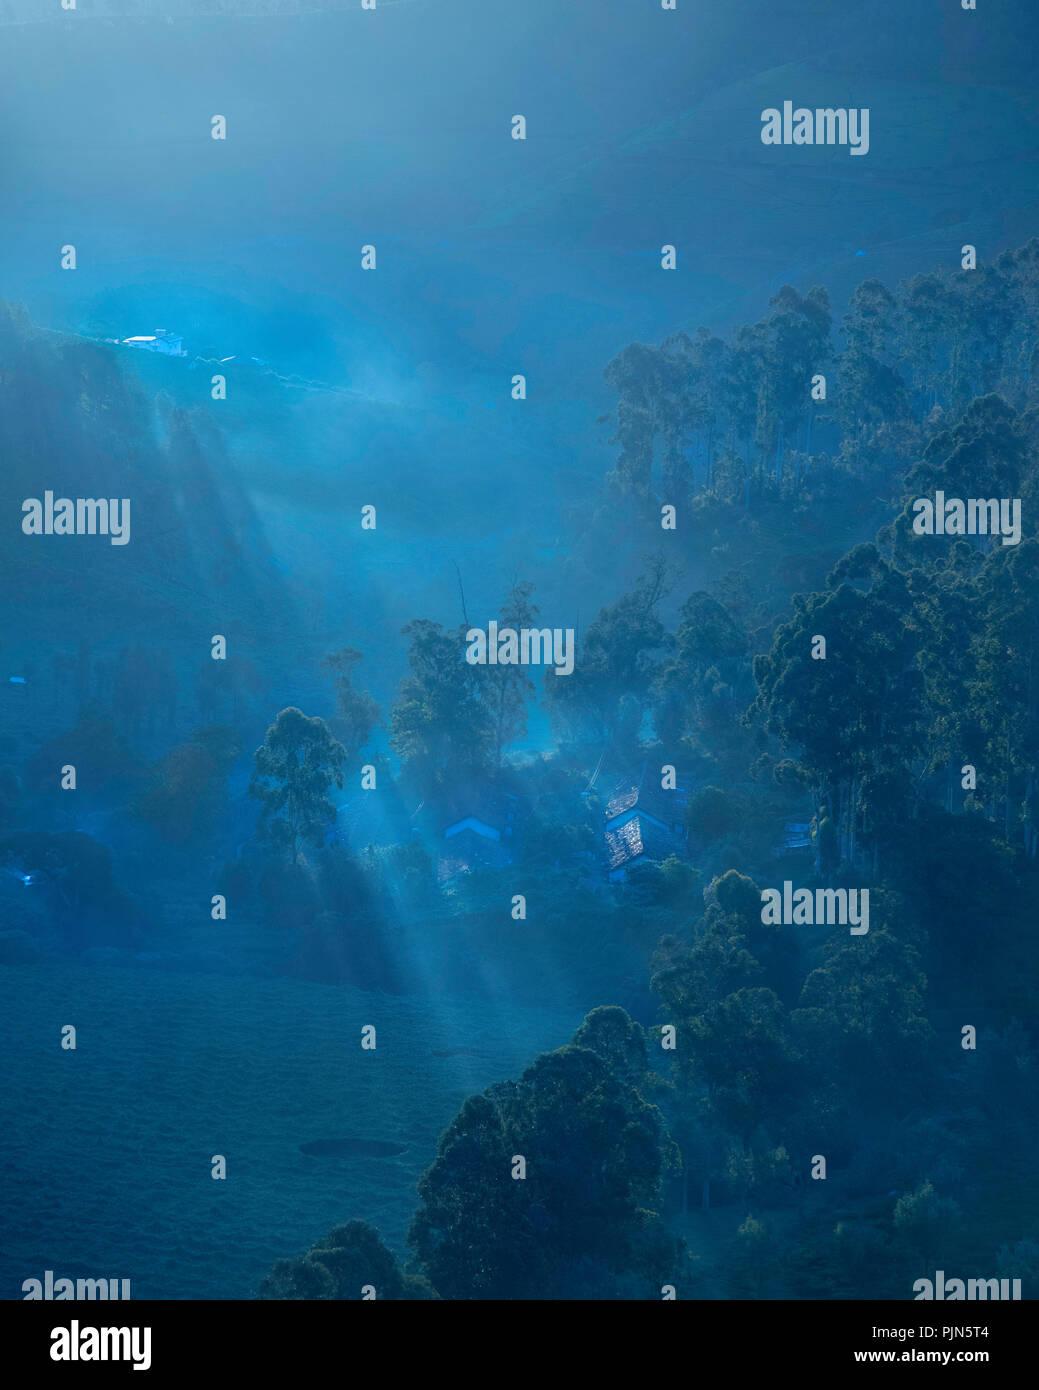 Nature Landscape Image Ooty - Stock Image